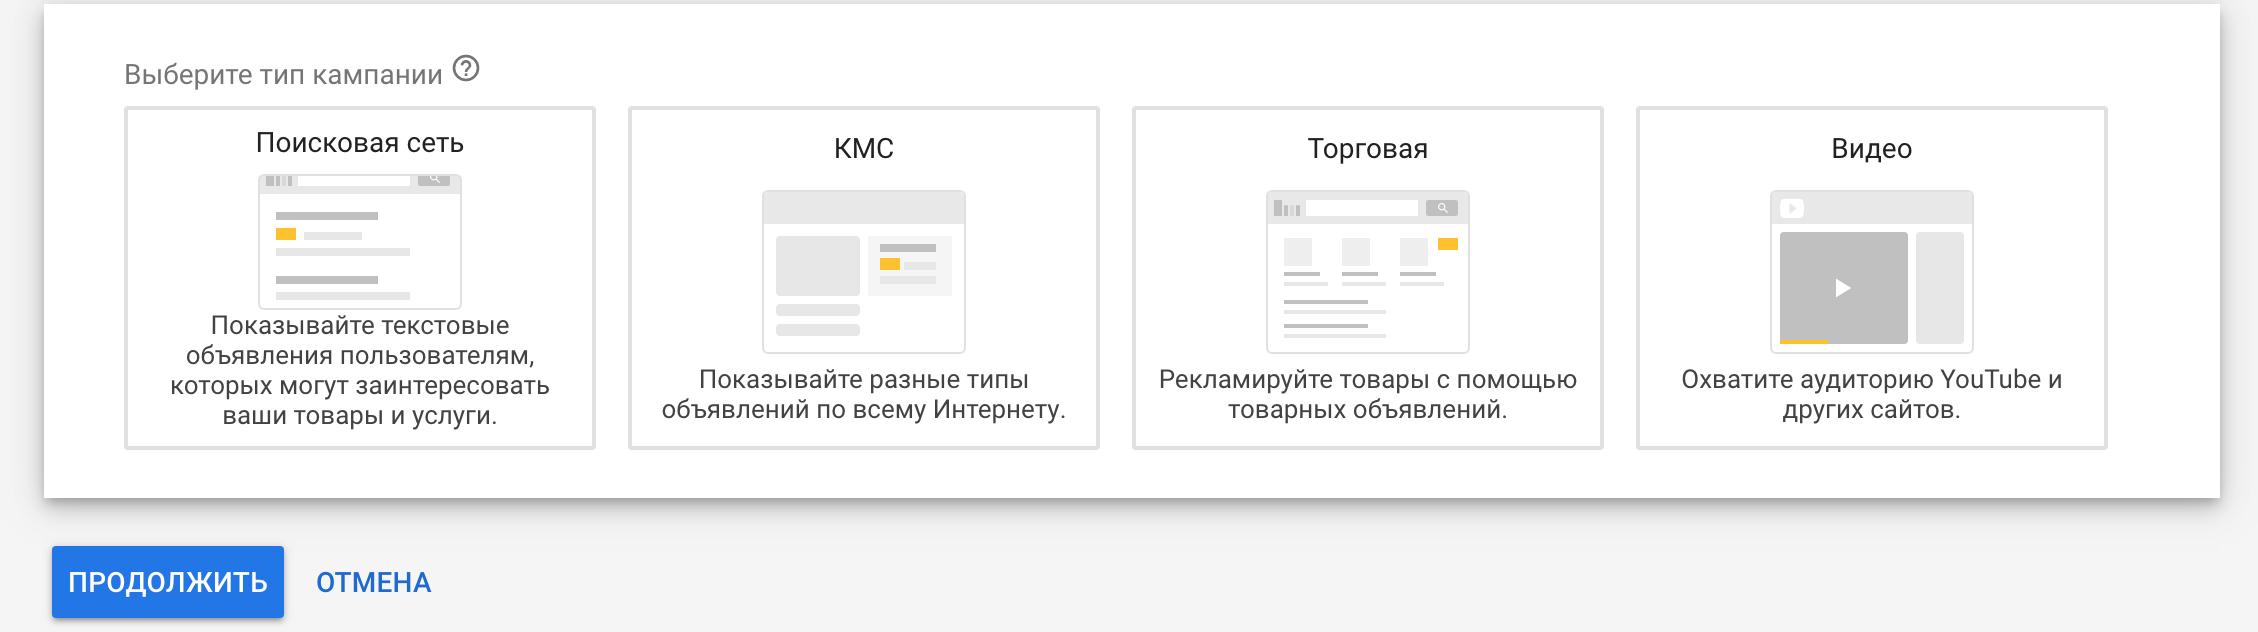 Тип компании КМС(GDN)